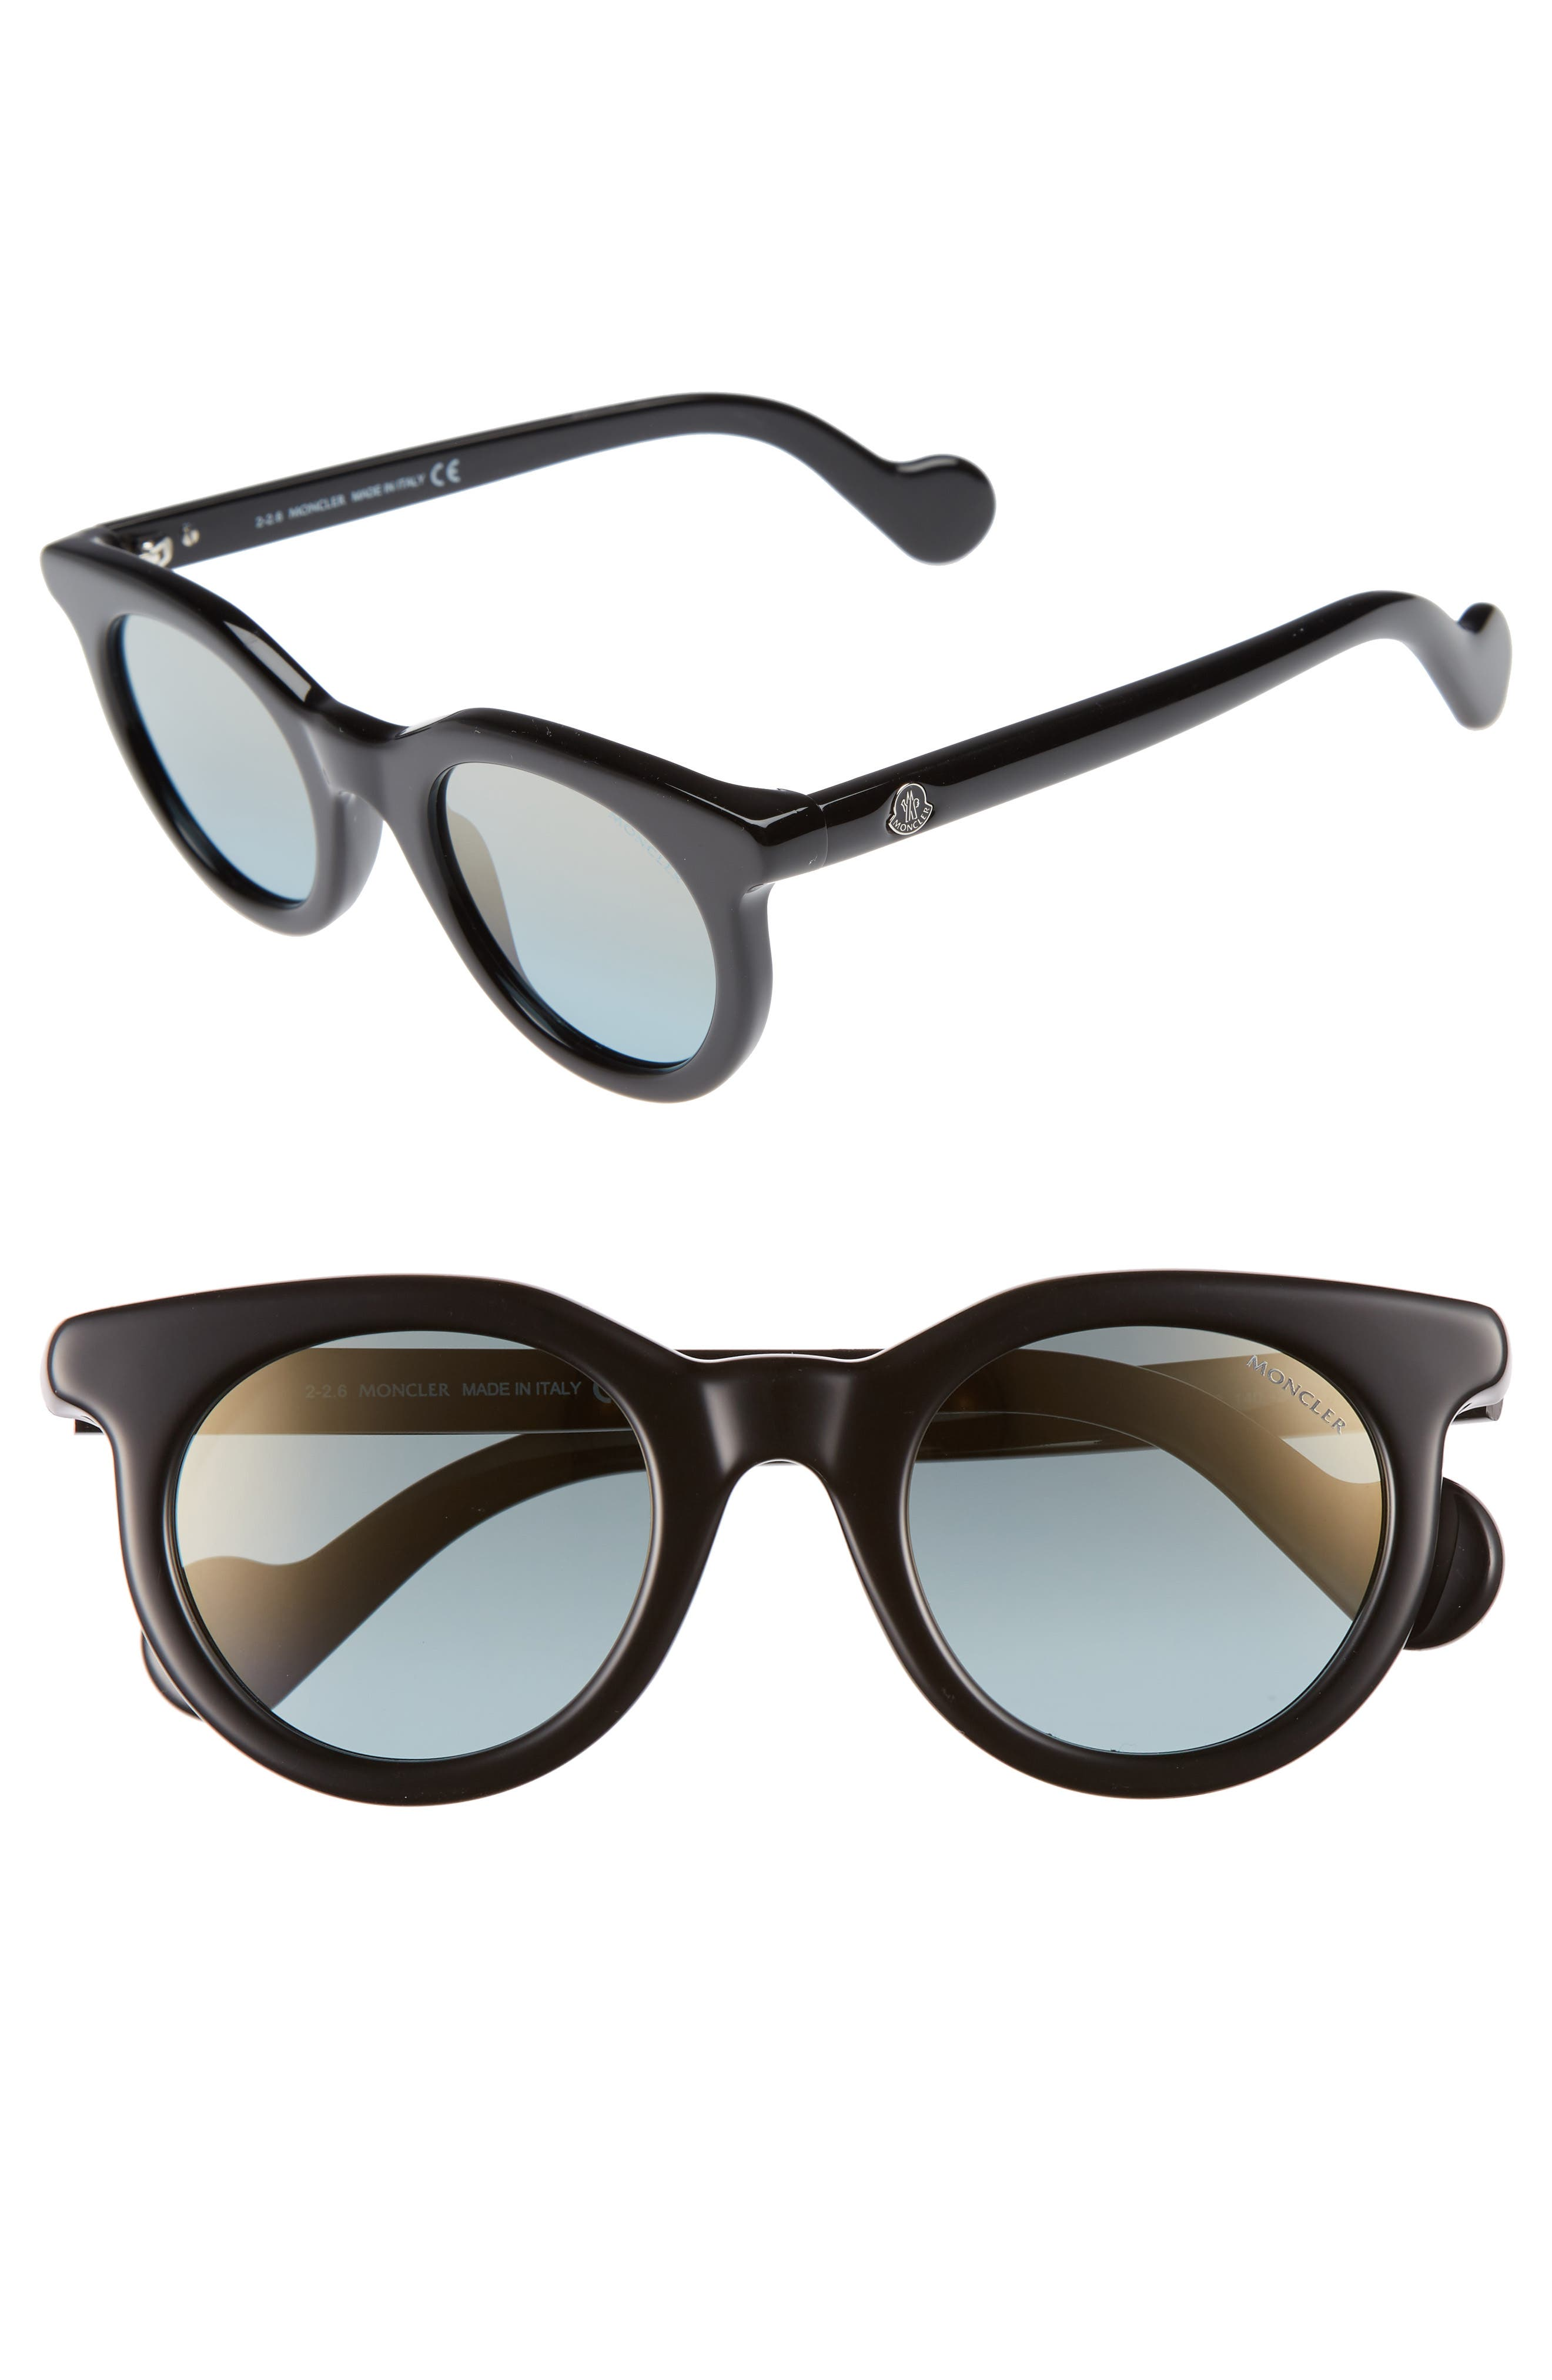 47mm Sunglasses,                         Main,                         color, Shiny Black/ Blue Mirror